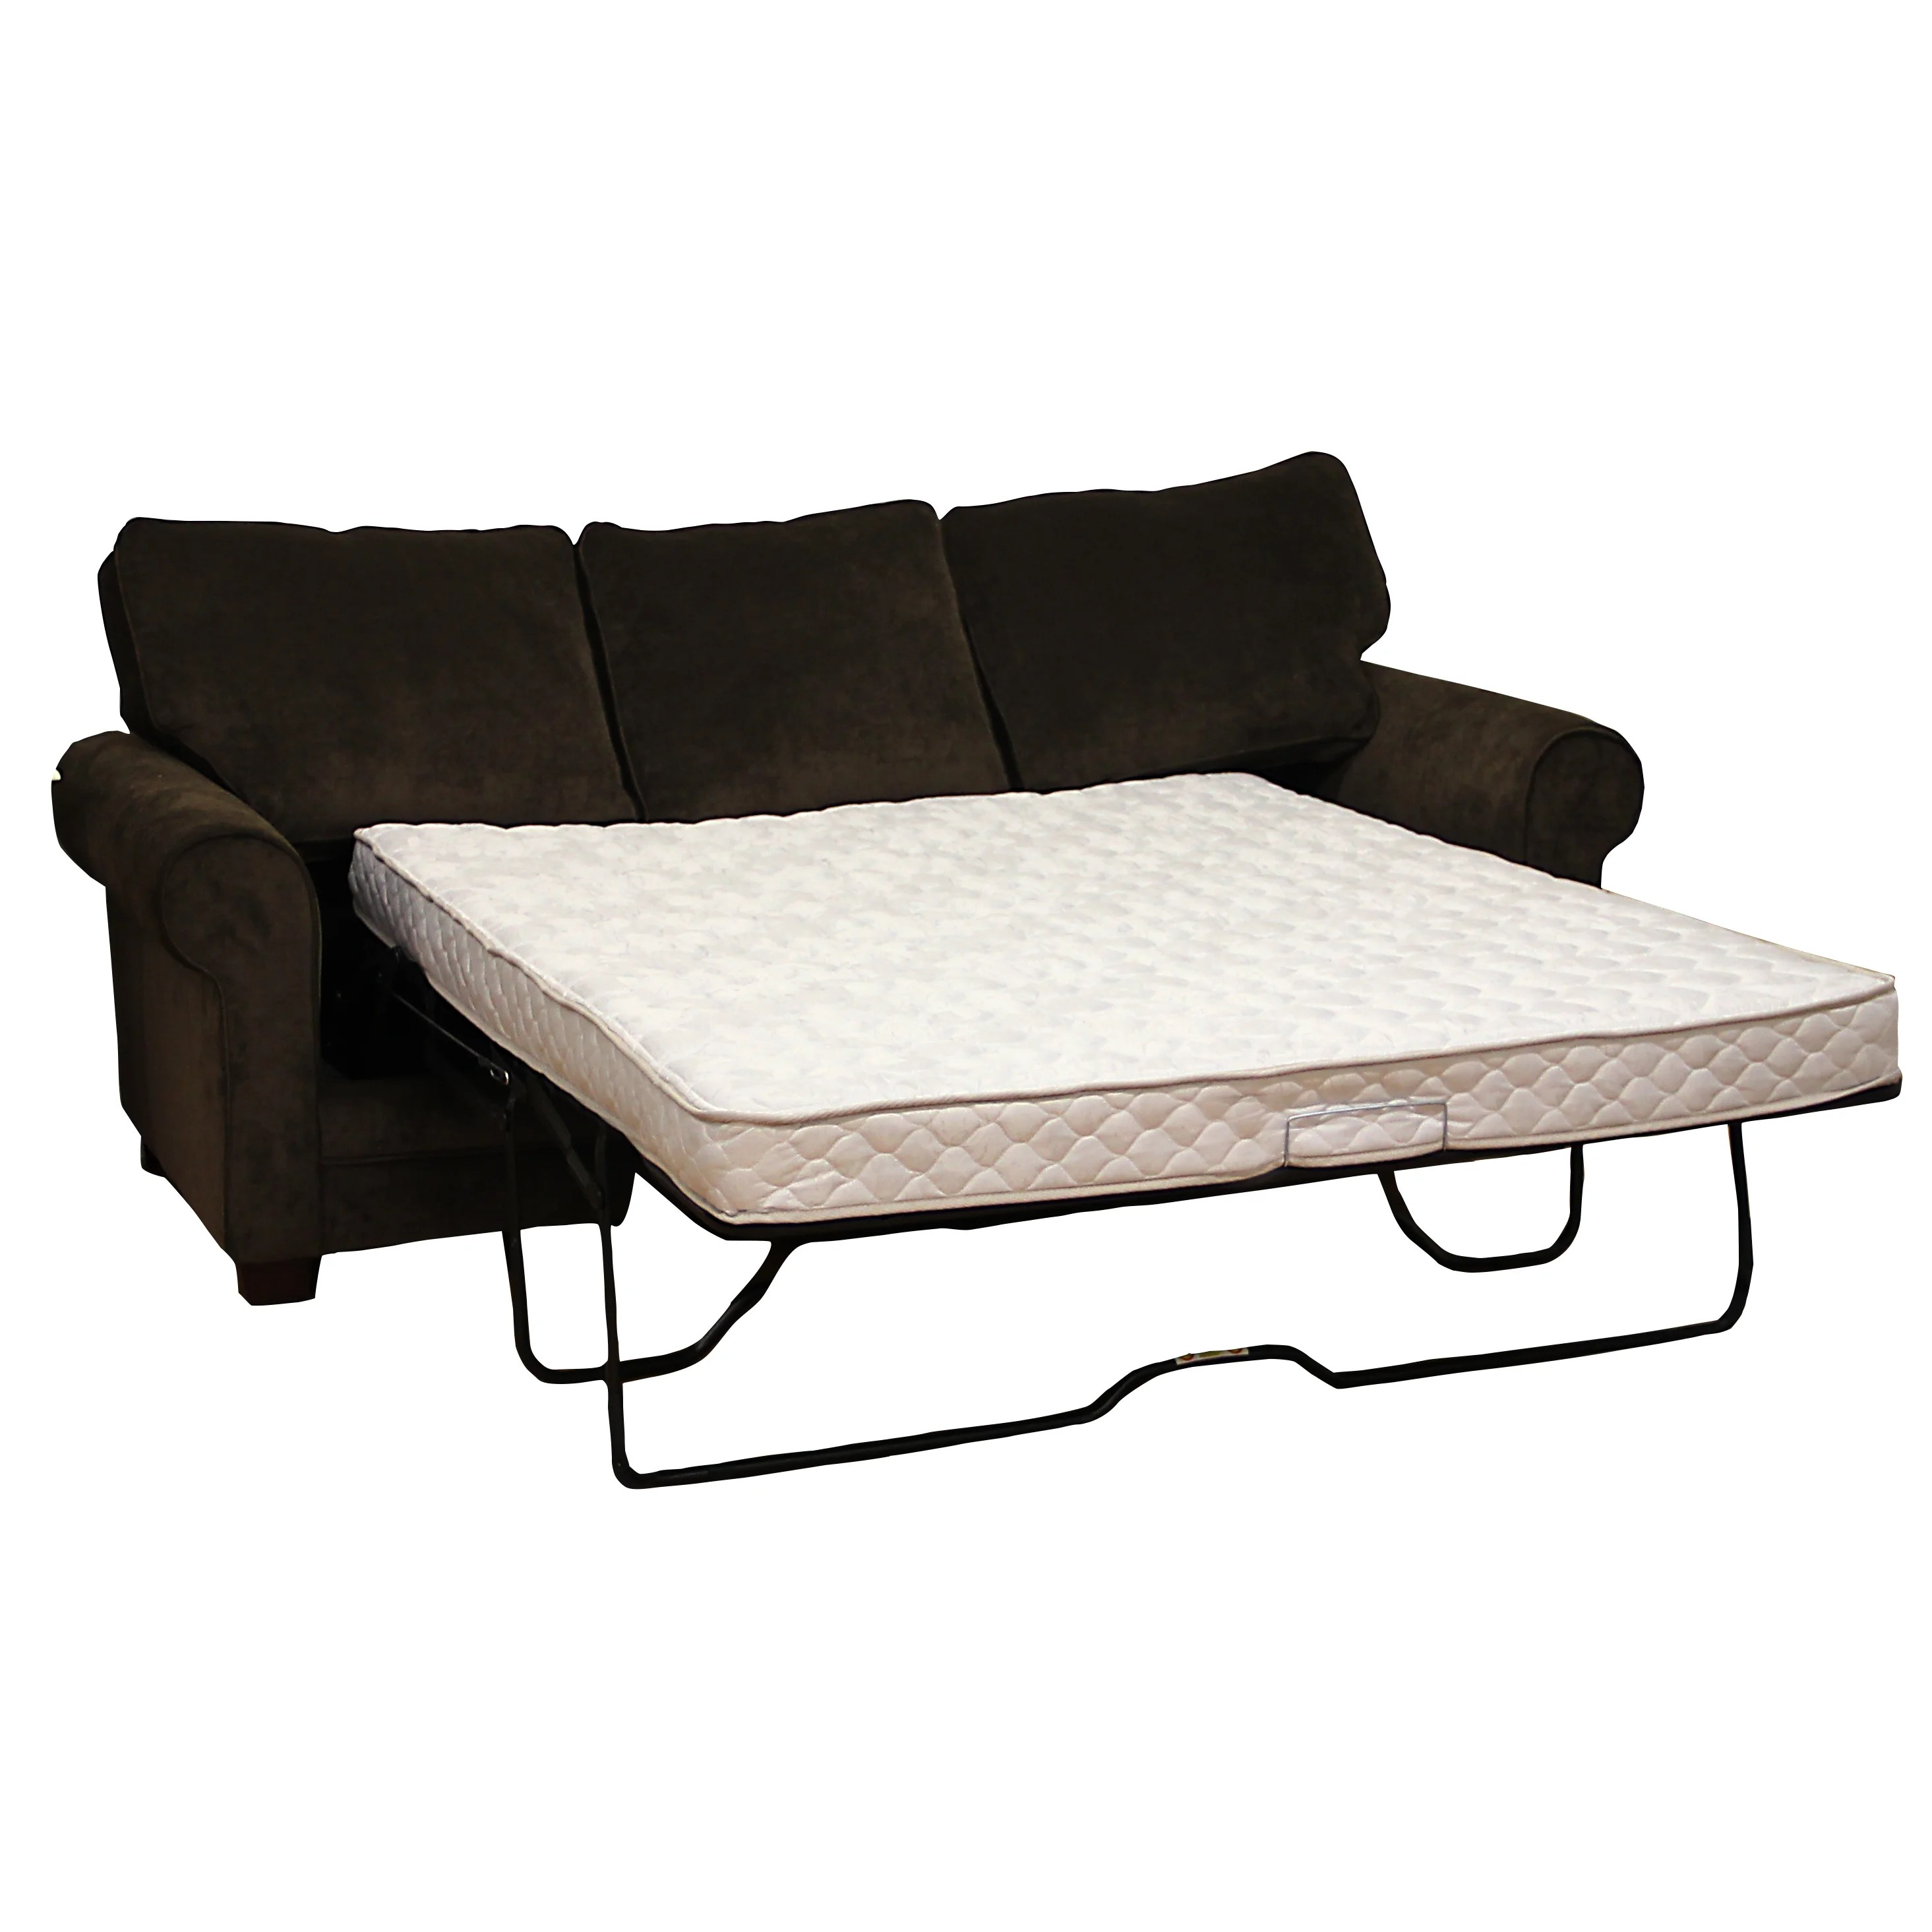 plush zara sofa review natuzzi editions corner classic brands 5 25 quot bed mattress and reviews